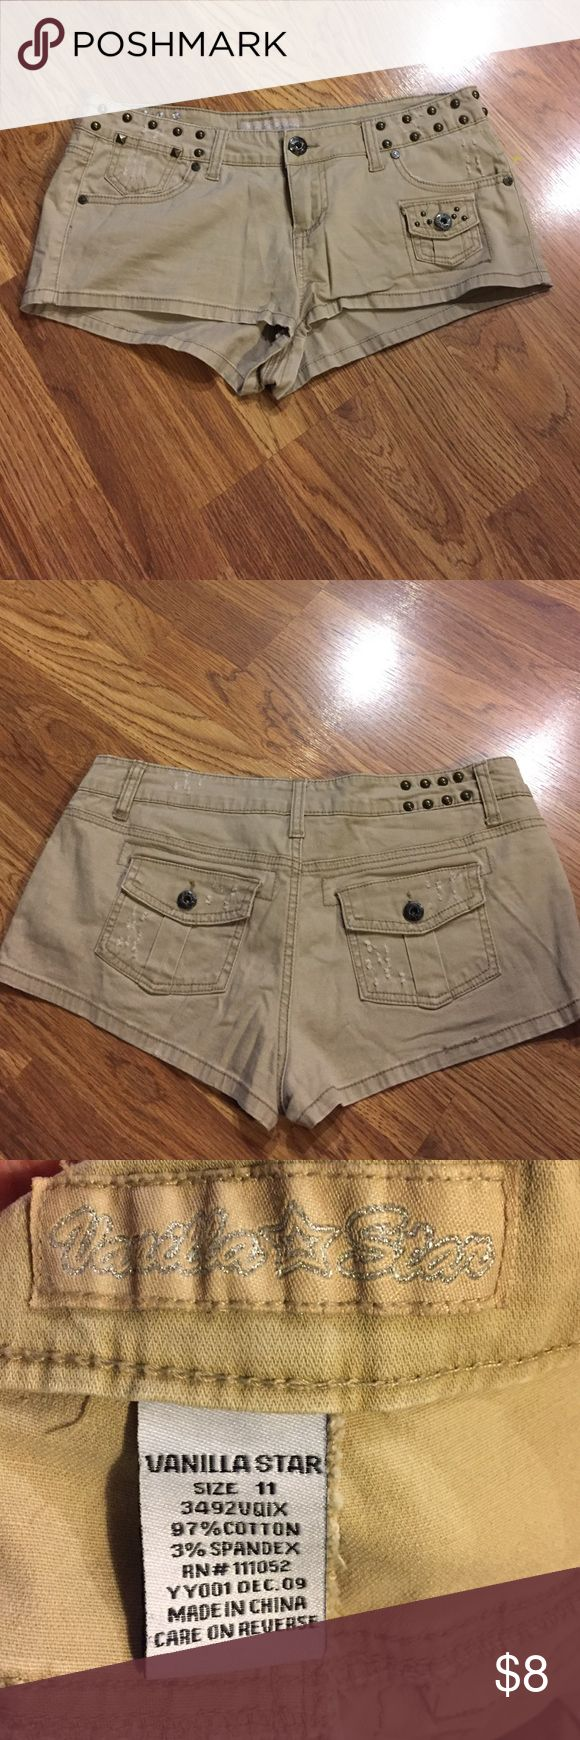 Juniors Shorts Great condition Shorts